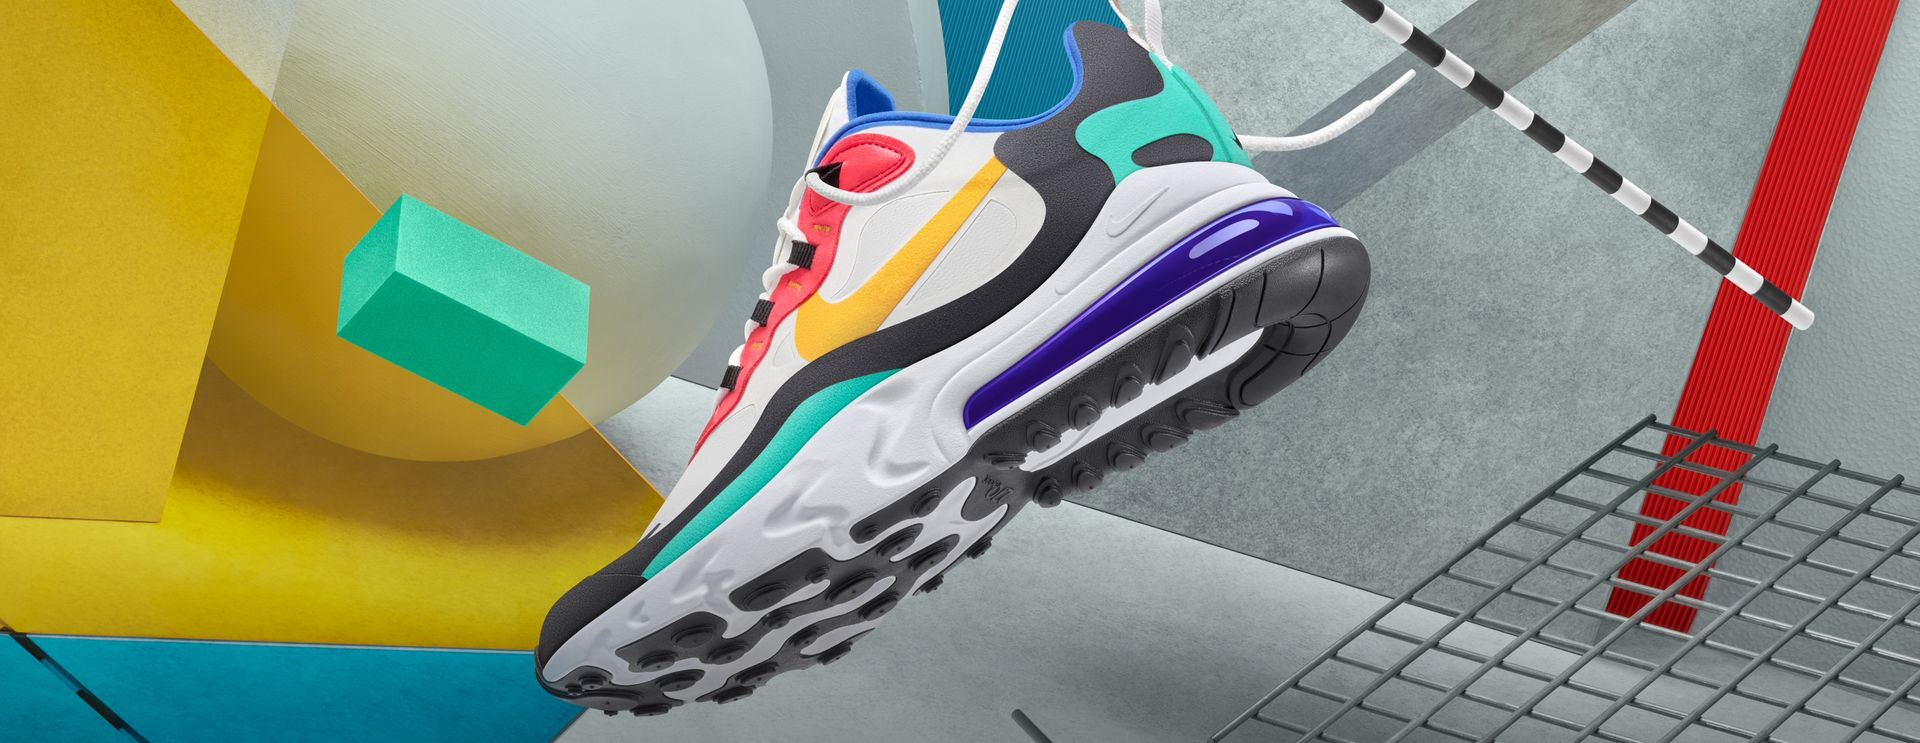 97cb2fae2e9 Επίσημος ιστότοπος Nike. Nike.com GR